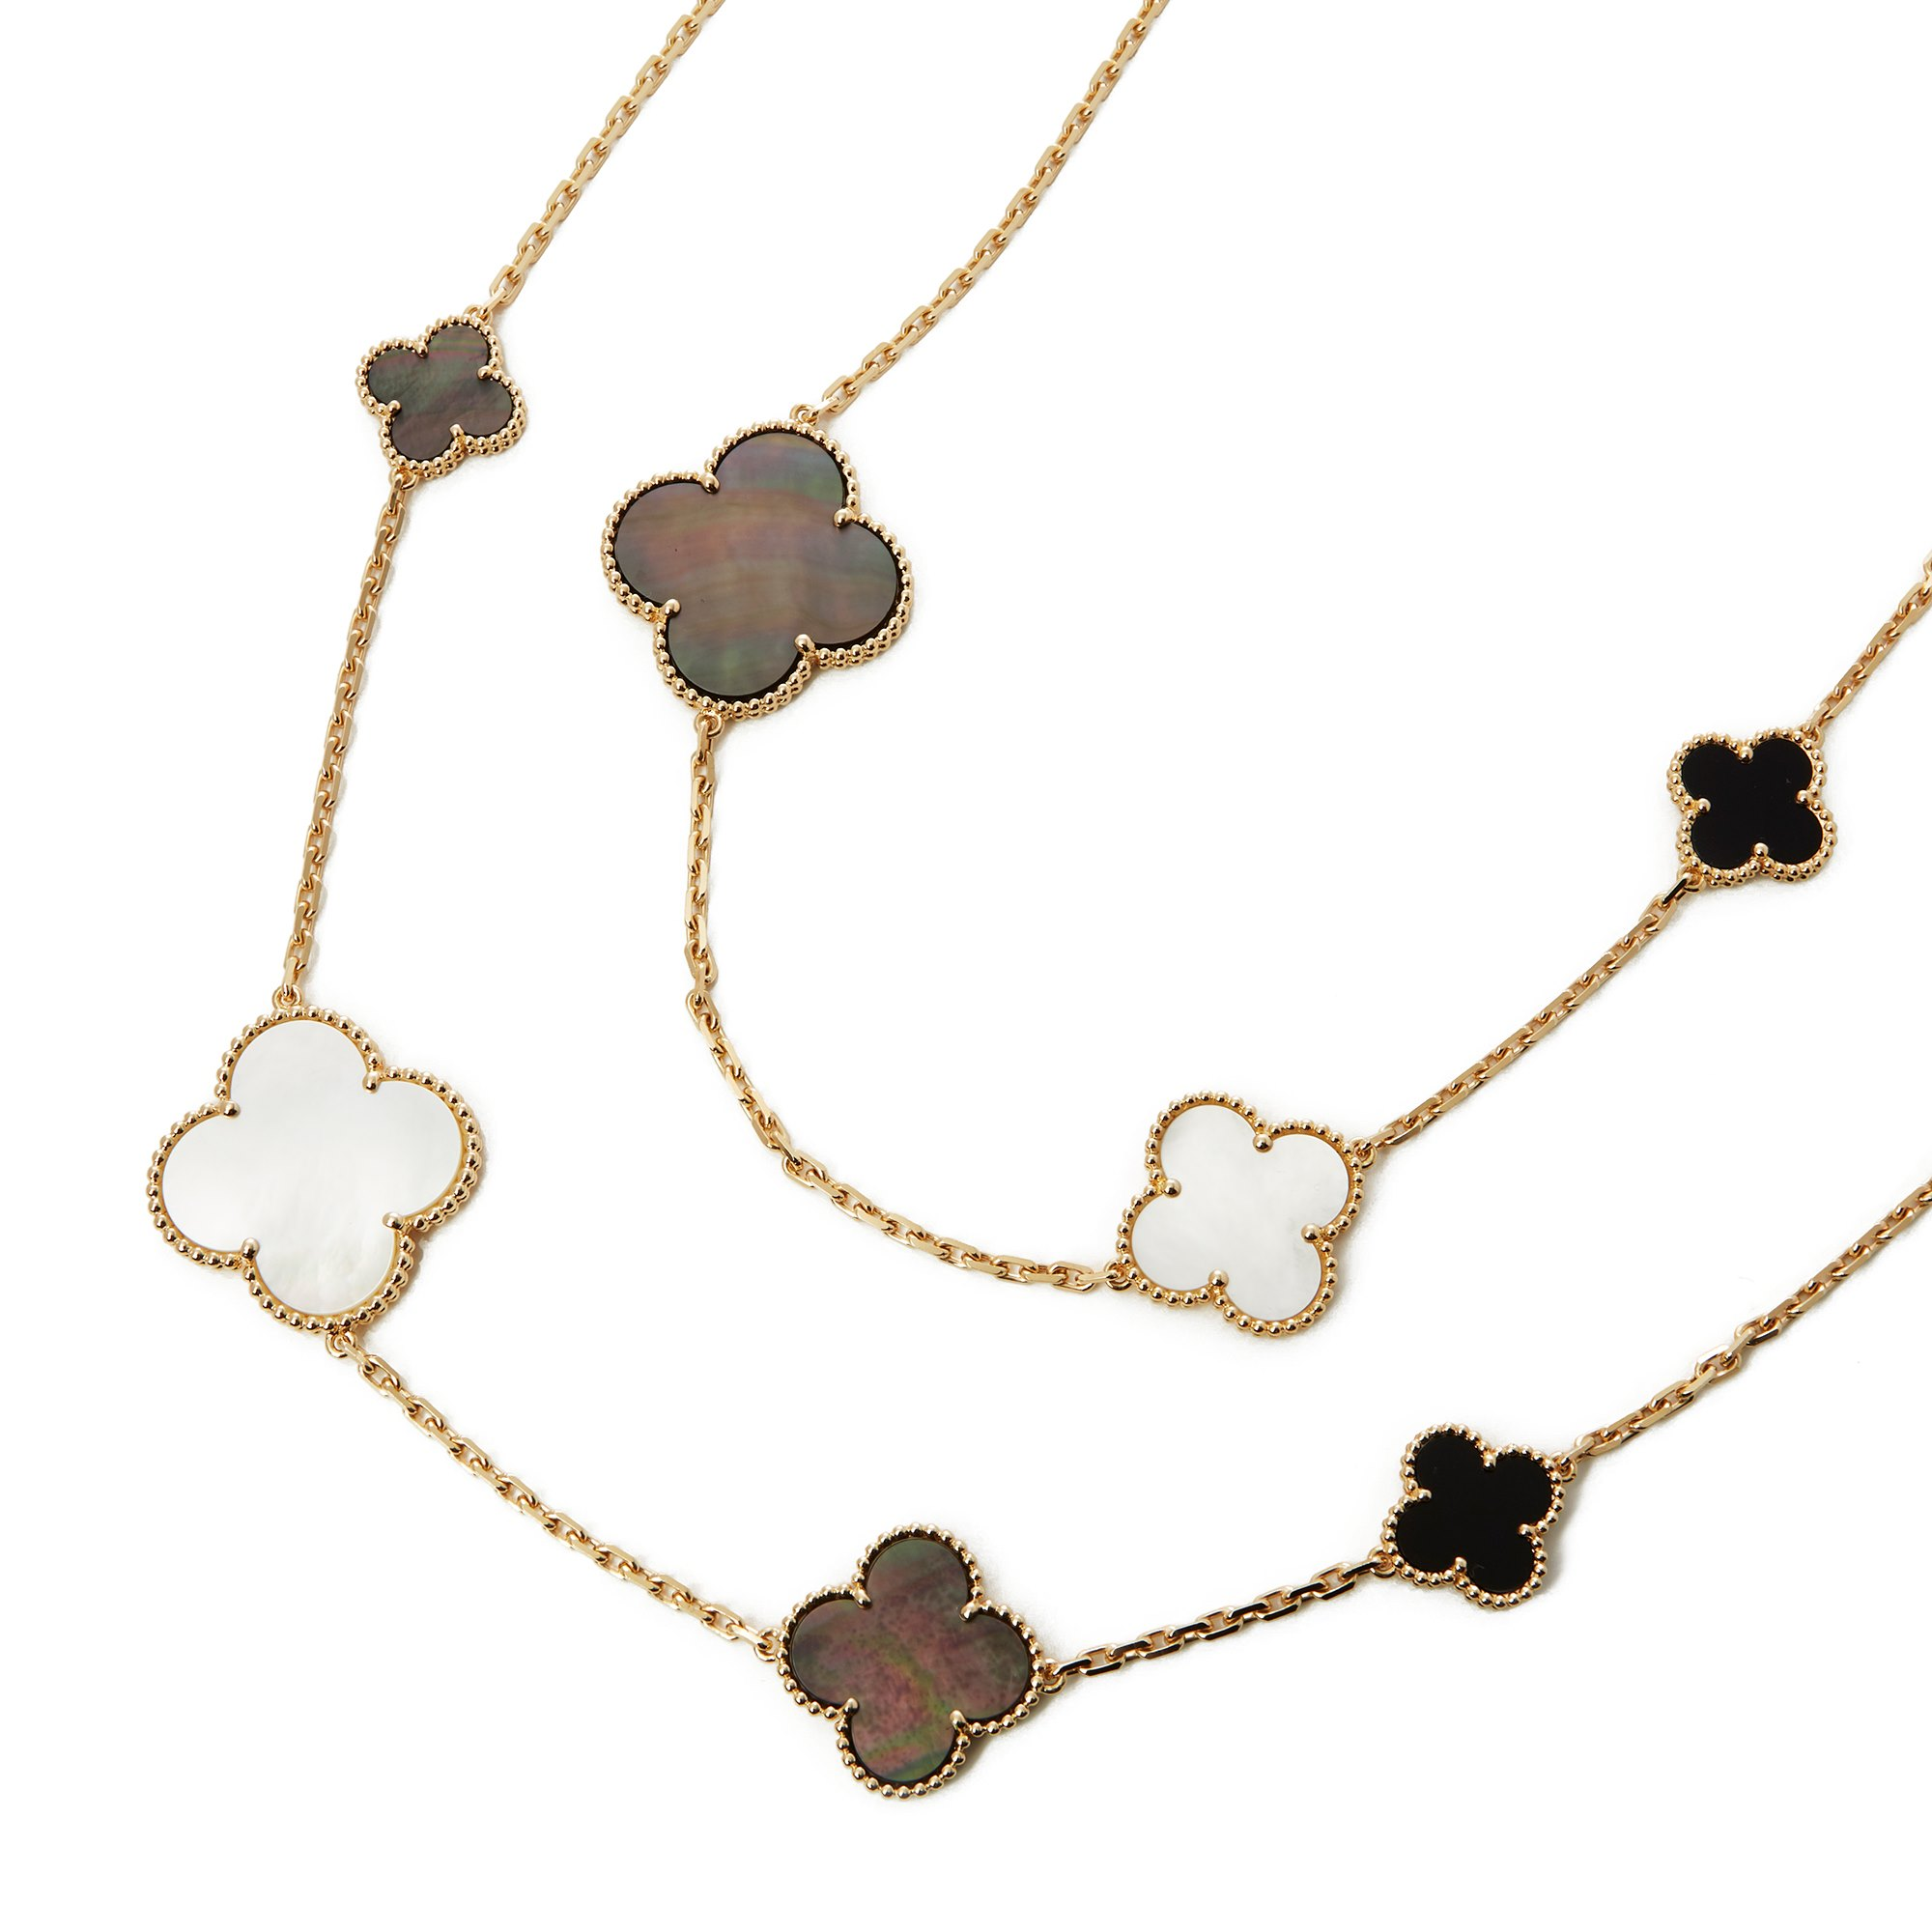 Van Cleef & Arpels Magic Alhambra Long Necklace 16 motifs